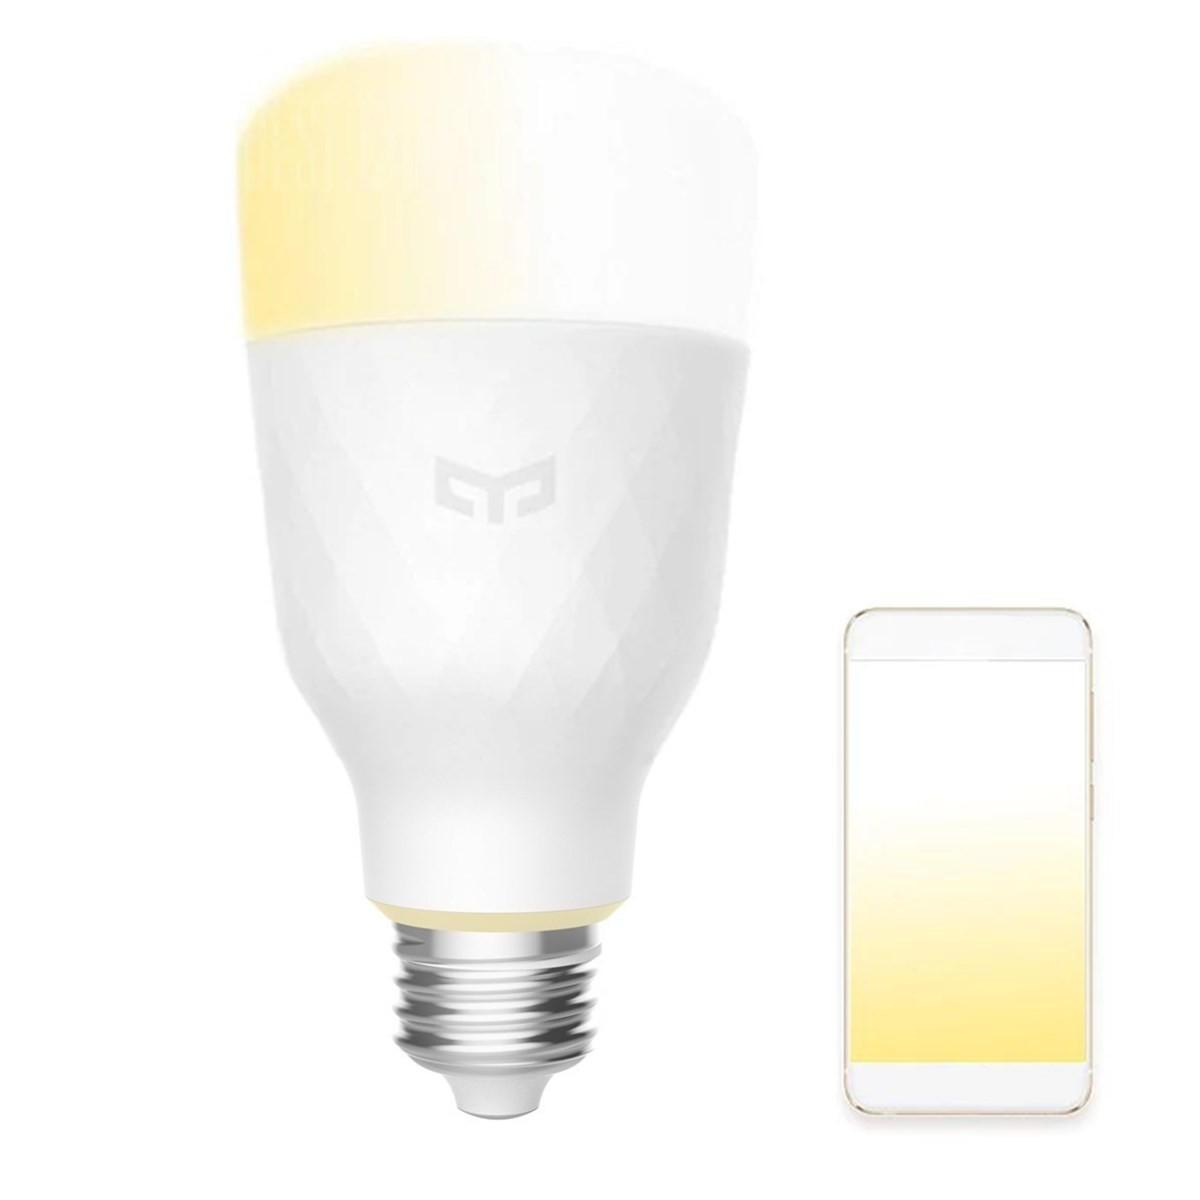 Yeelight YLDP05YL E27 10W Warm White to Daywhite WiFi APP Smart LED Bulb AC100-240V(Xiaomi Ecosystem Product) Coupon:YEEYLDB $14.19